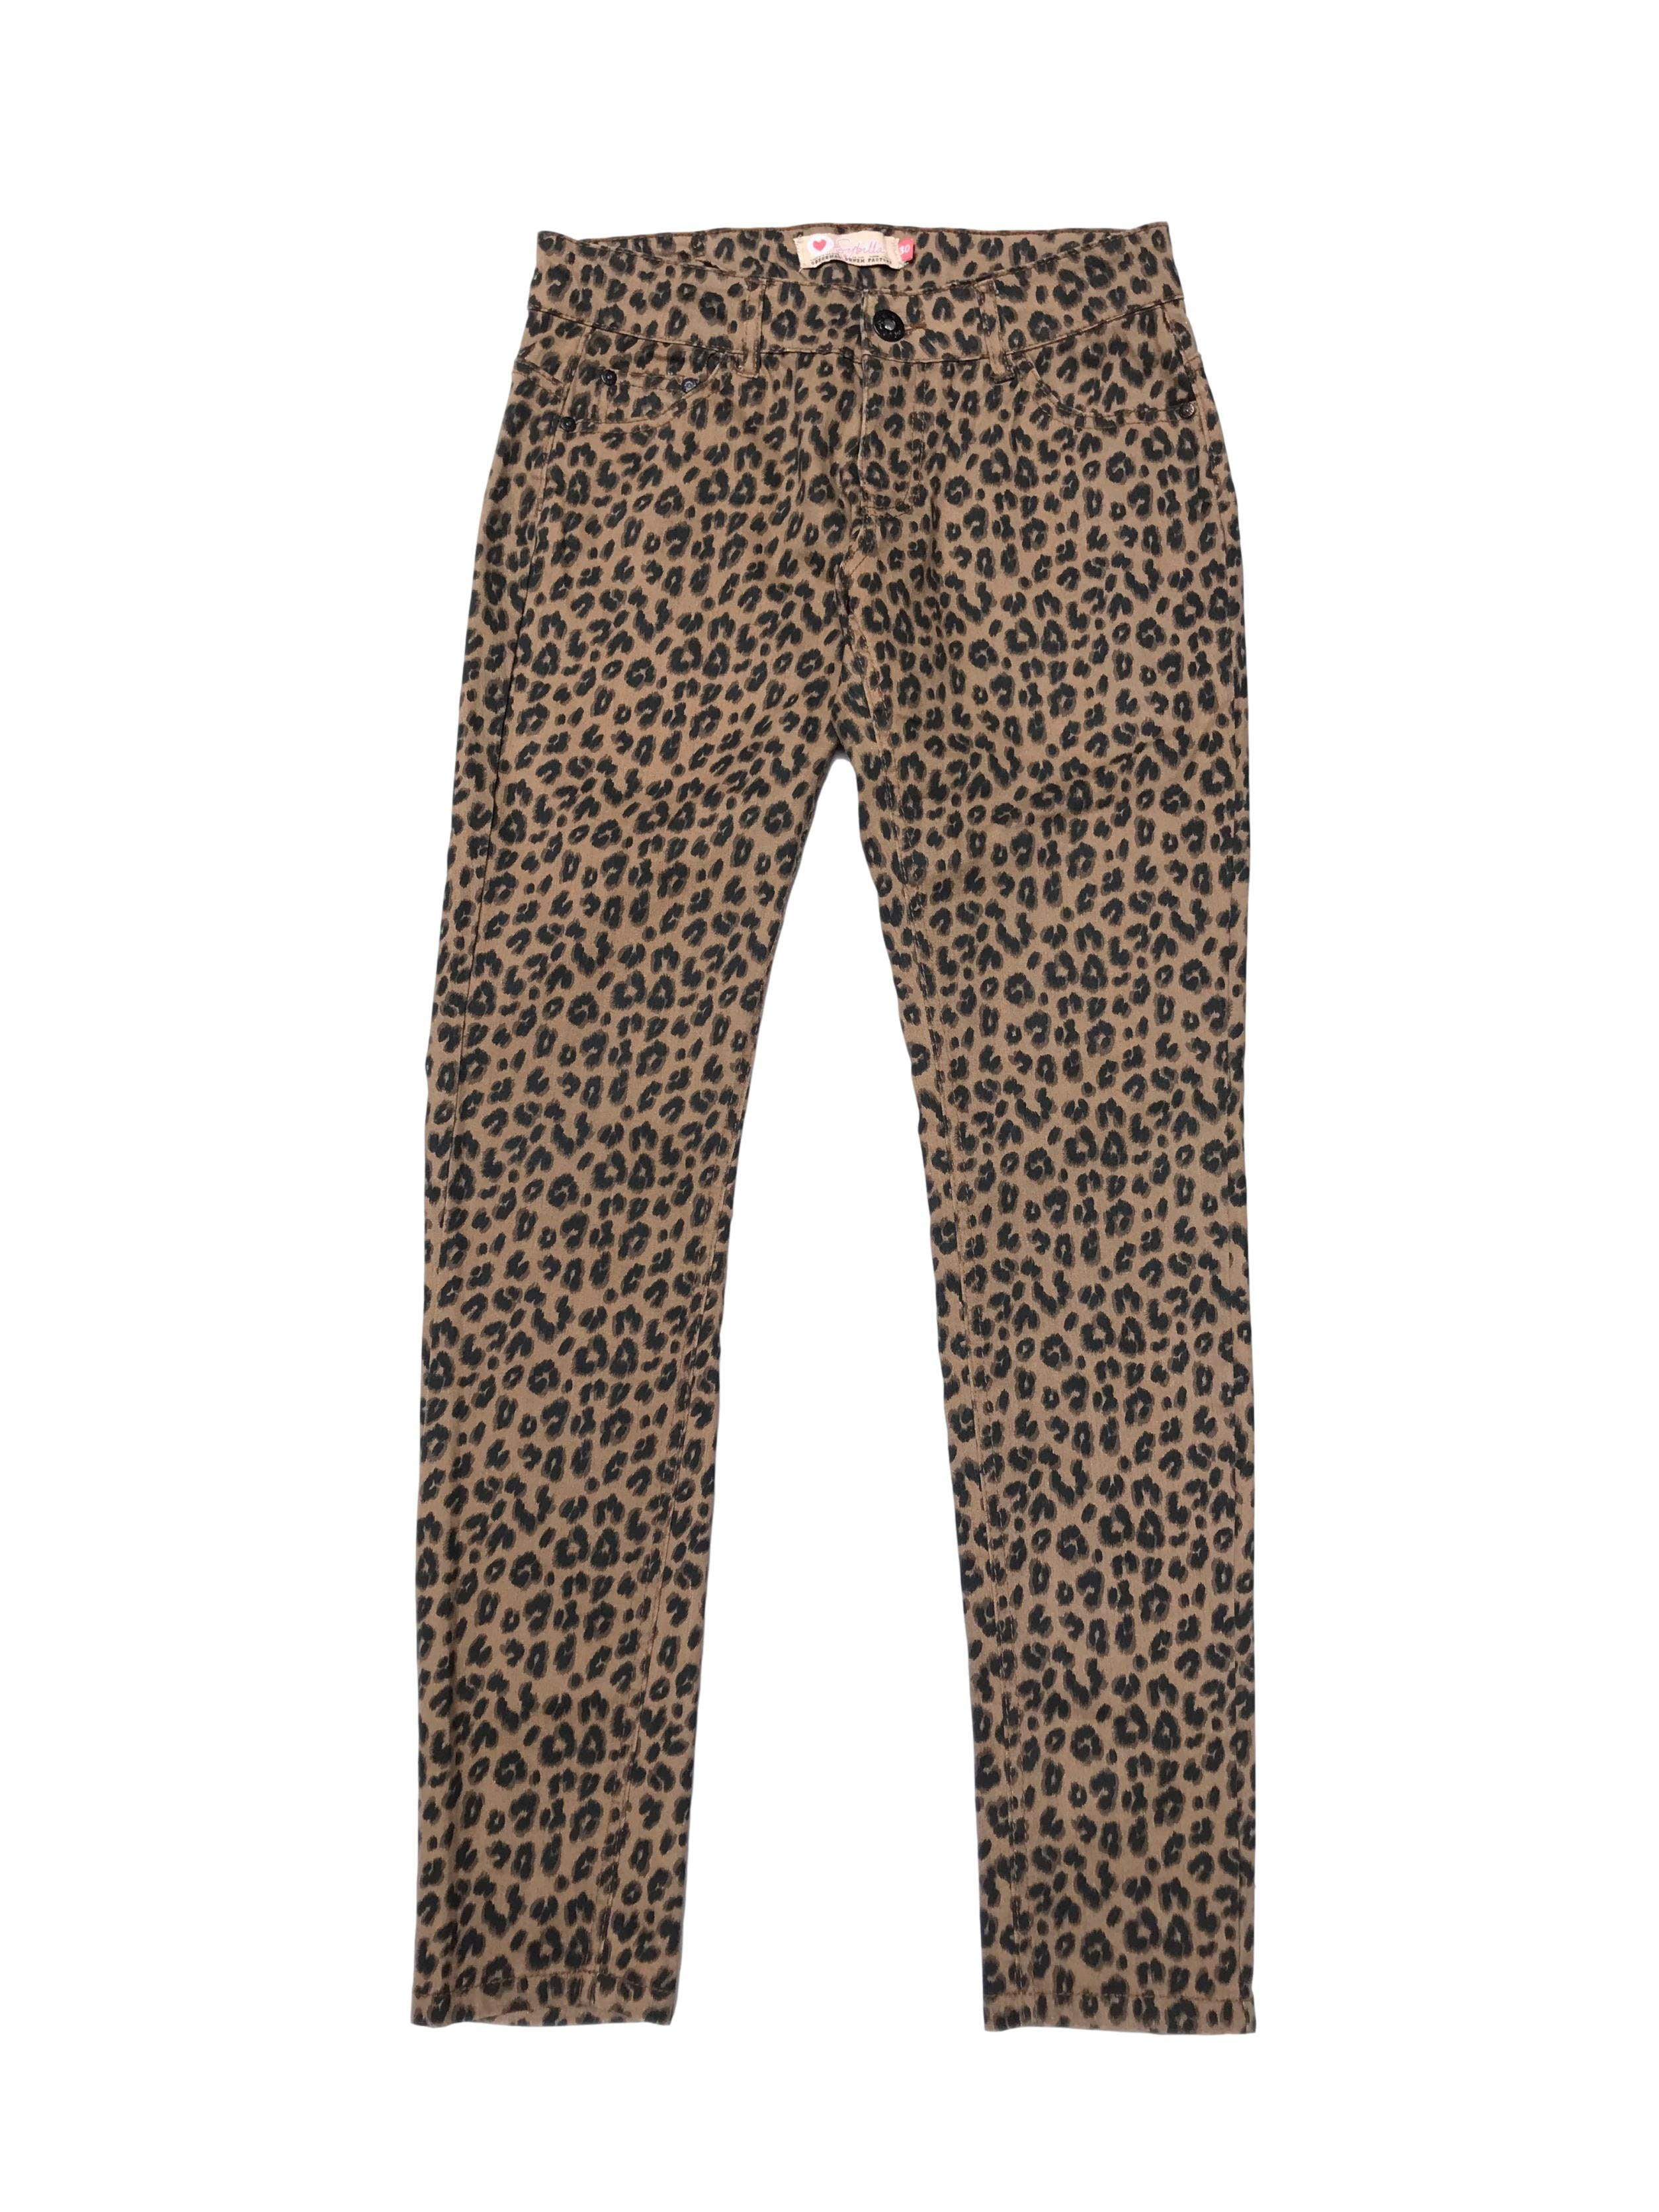 Pantalón denim stretch animal print, skinny con bolsillos laterales y atrás. Cintura 76cm